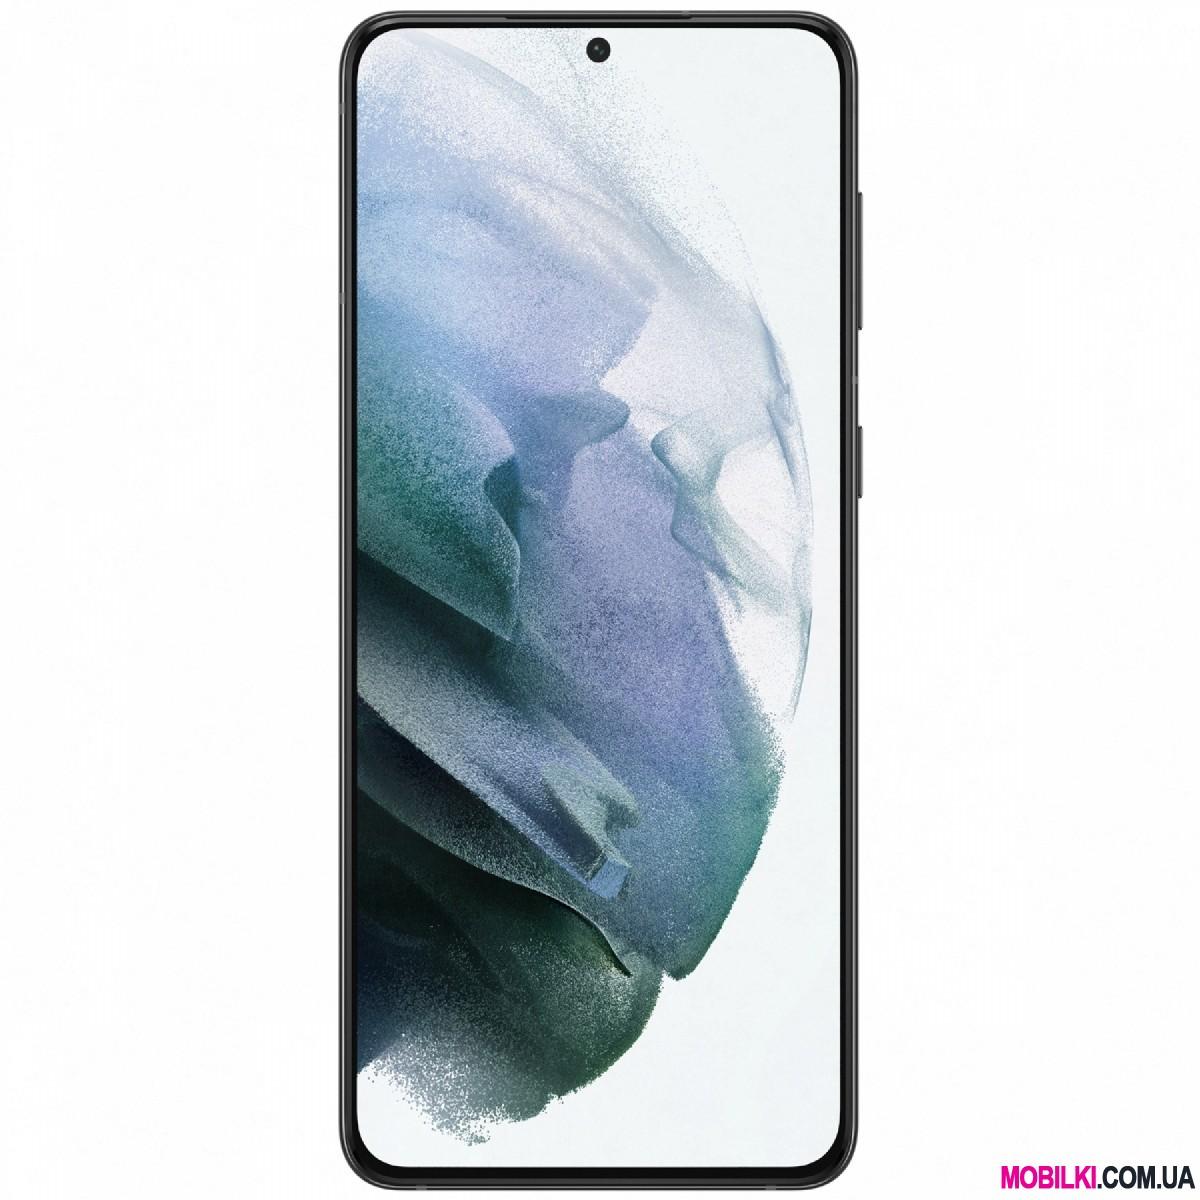 Samsung Galaxy S21 Plus 8/128Gb